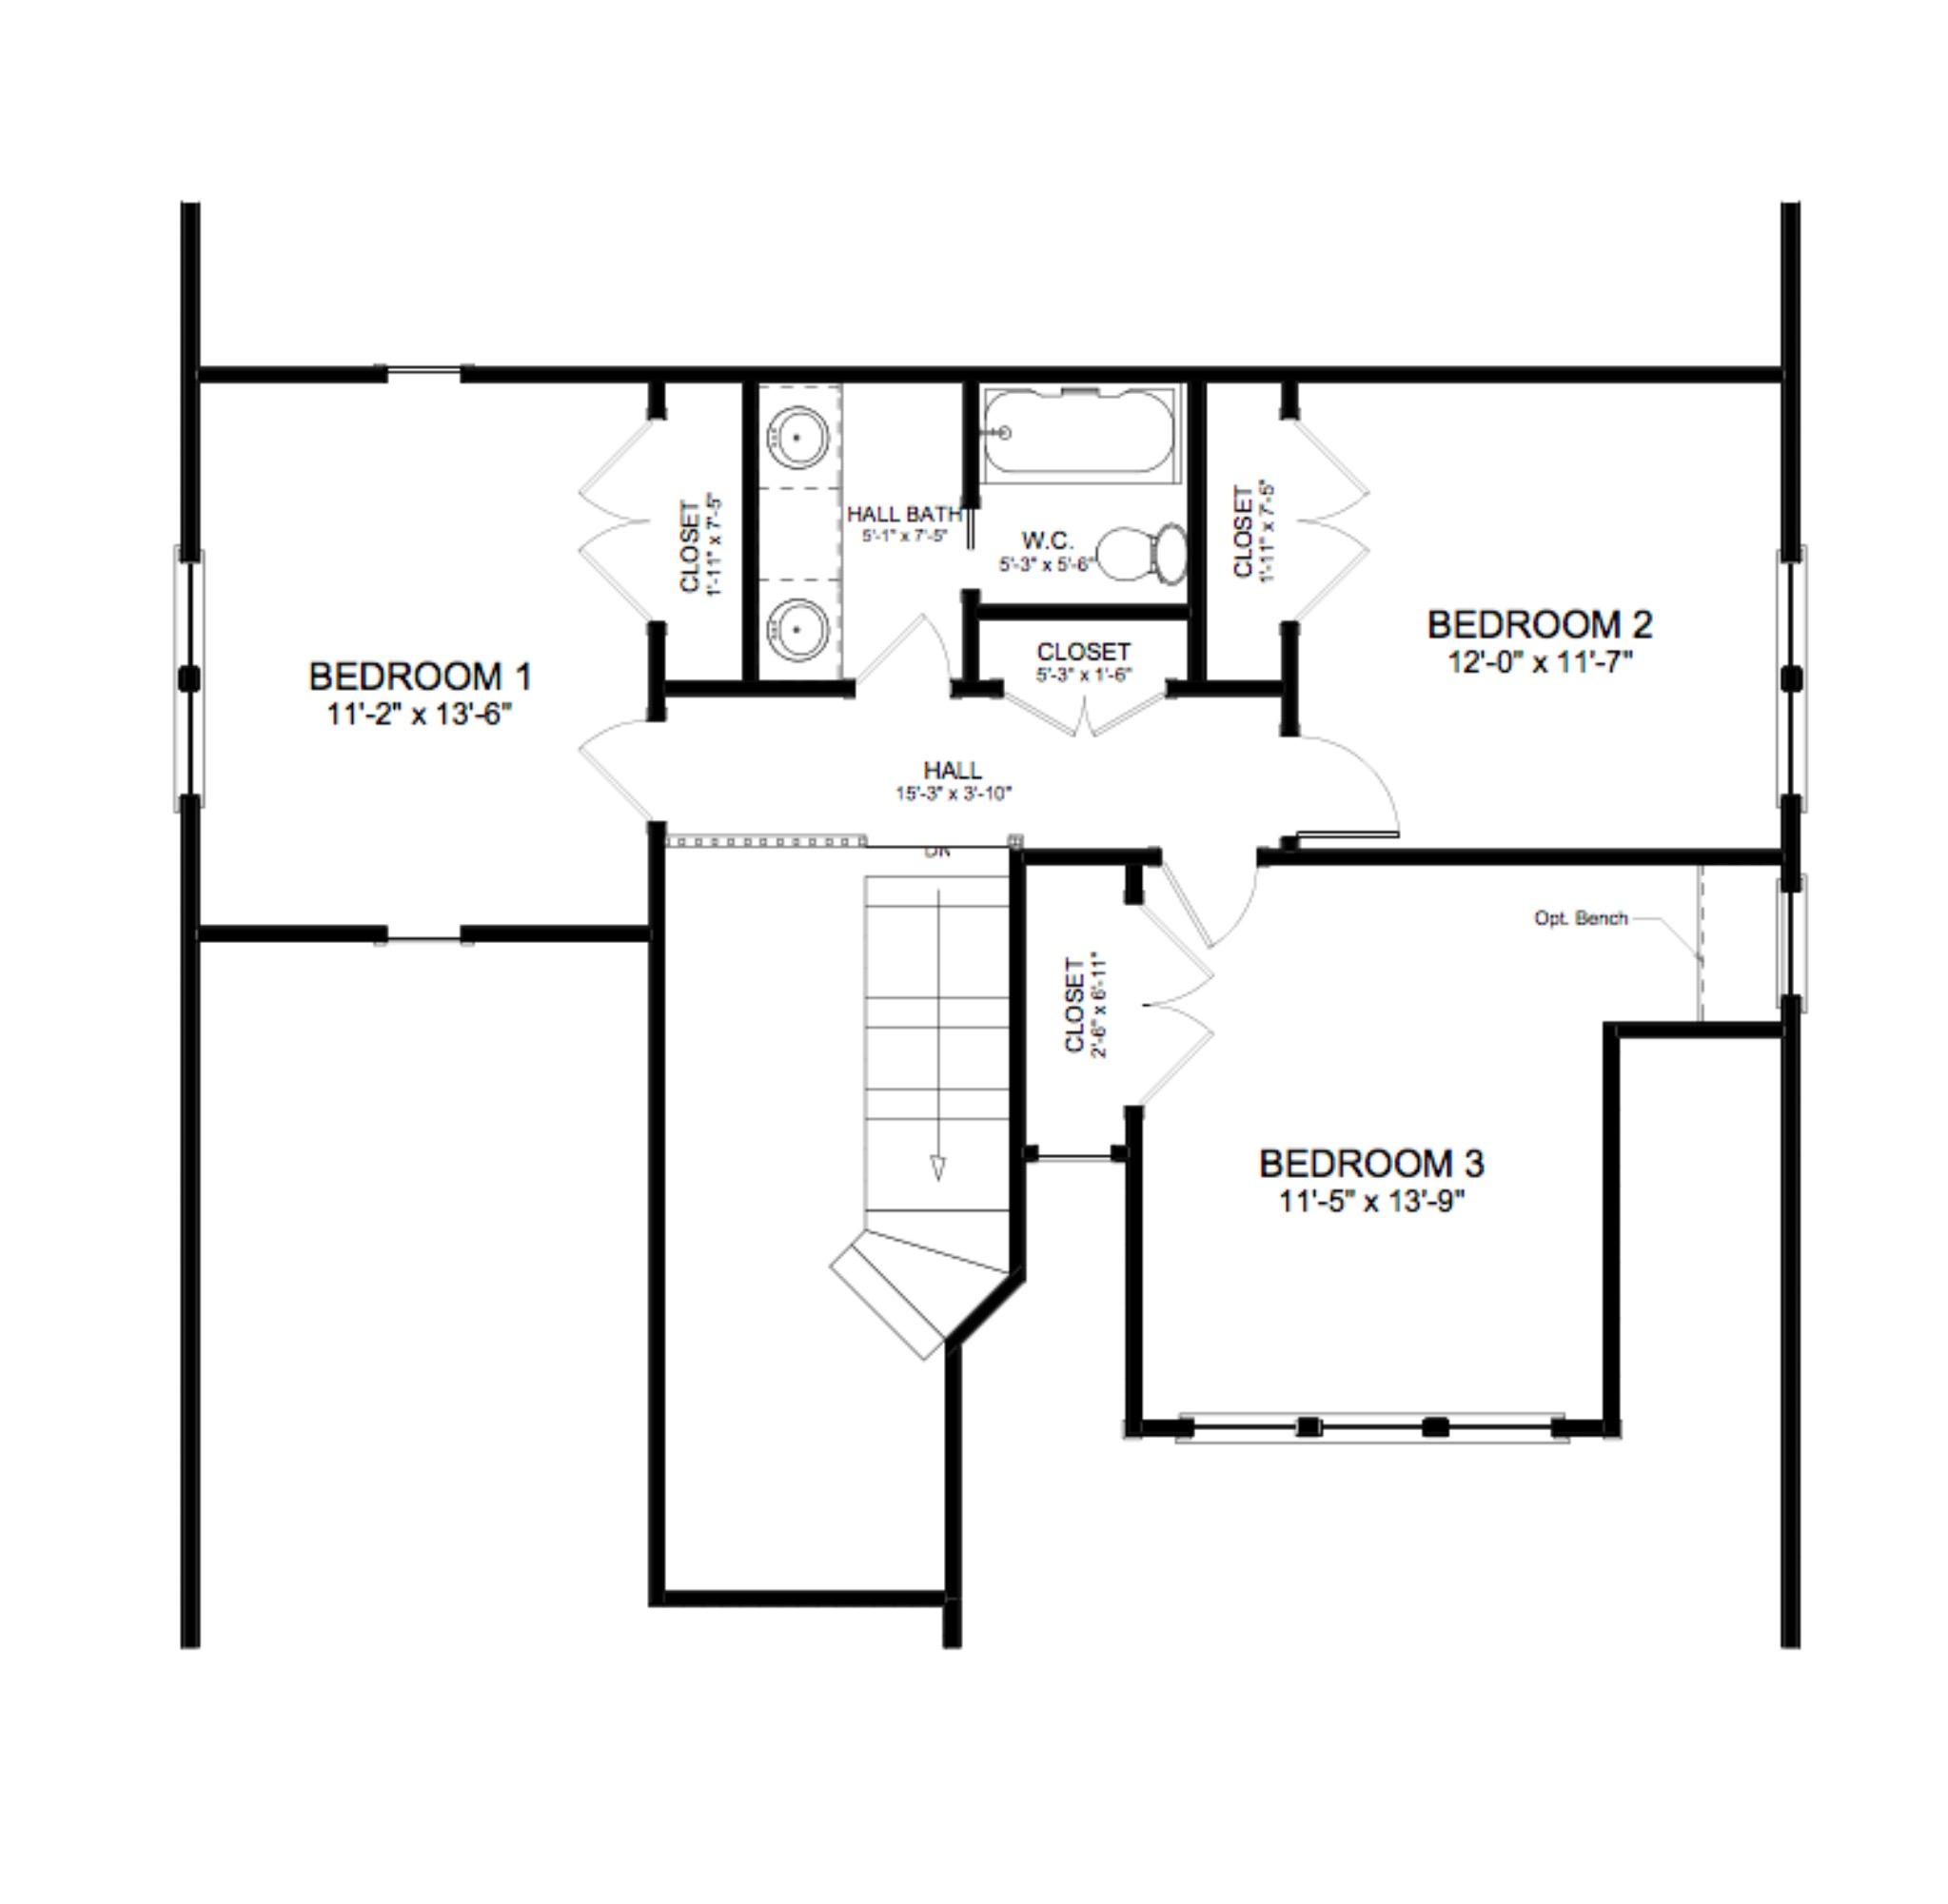 Hotel Virginia Beach Va Map | Wiring Diagram Database